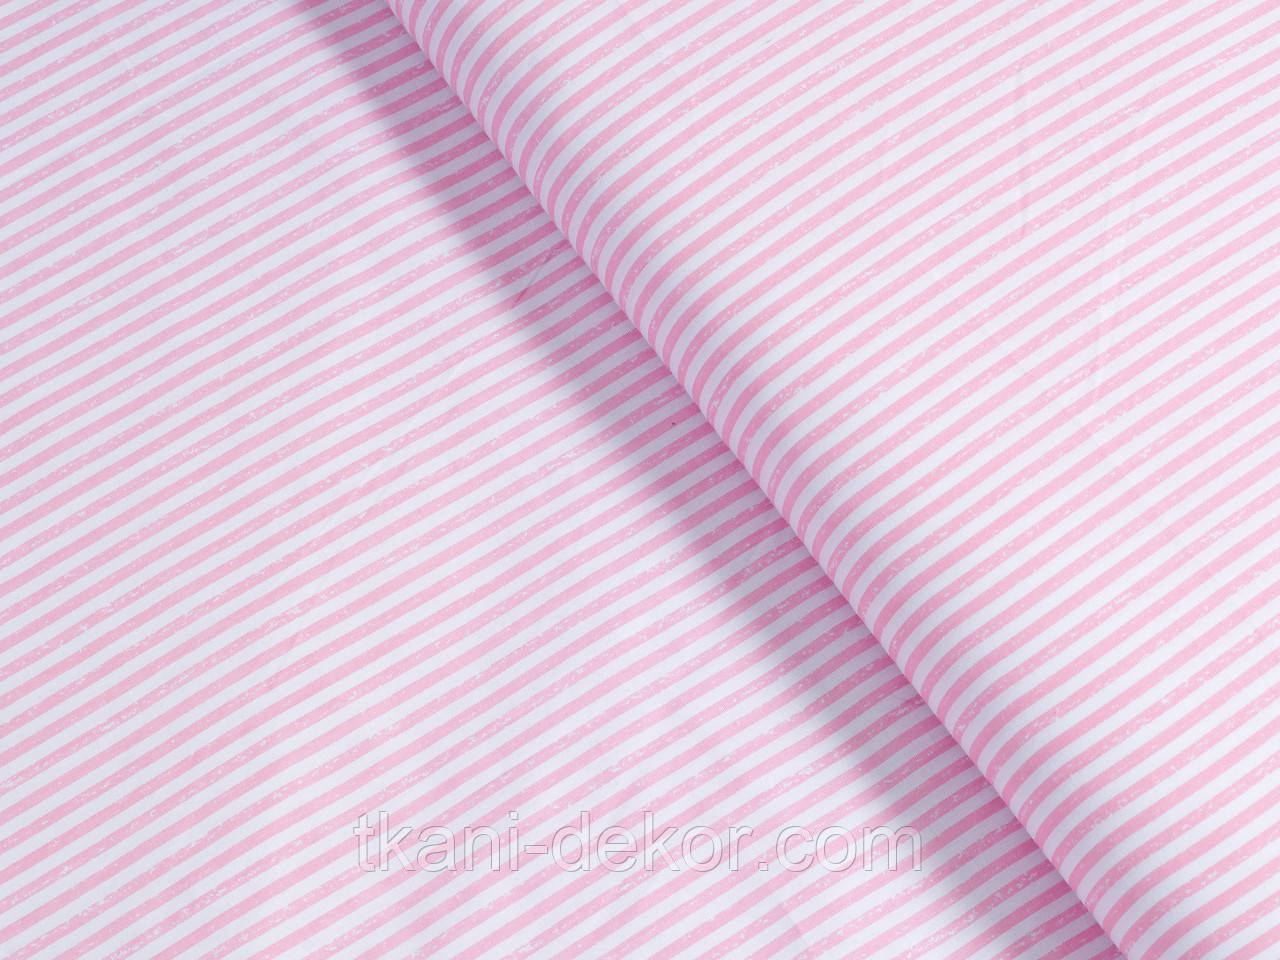 Сатин (хлопковая ткань) размытая розовая полоска